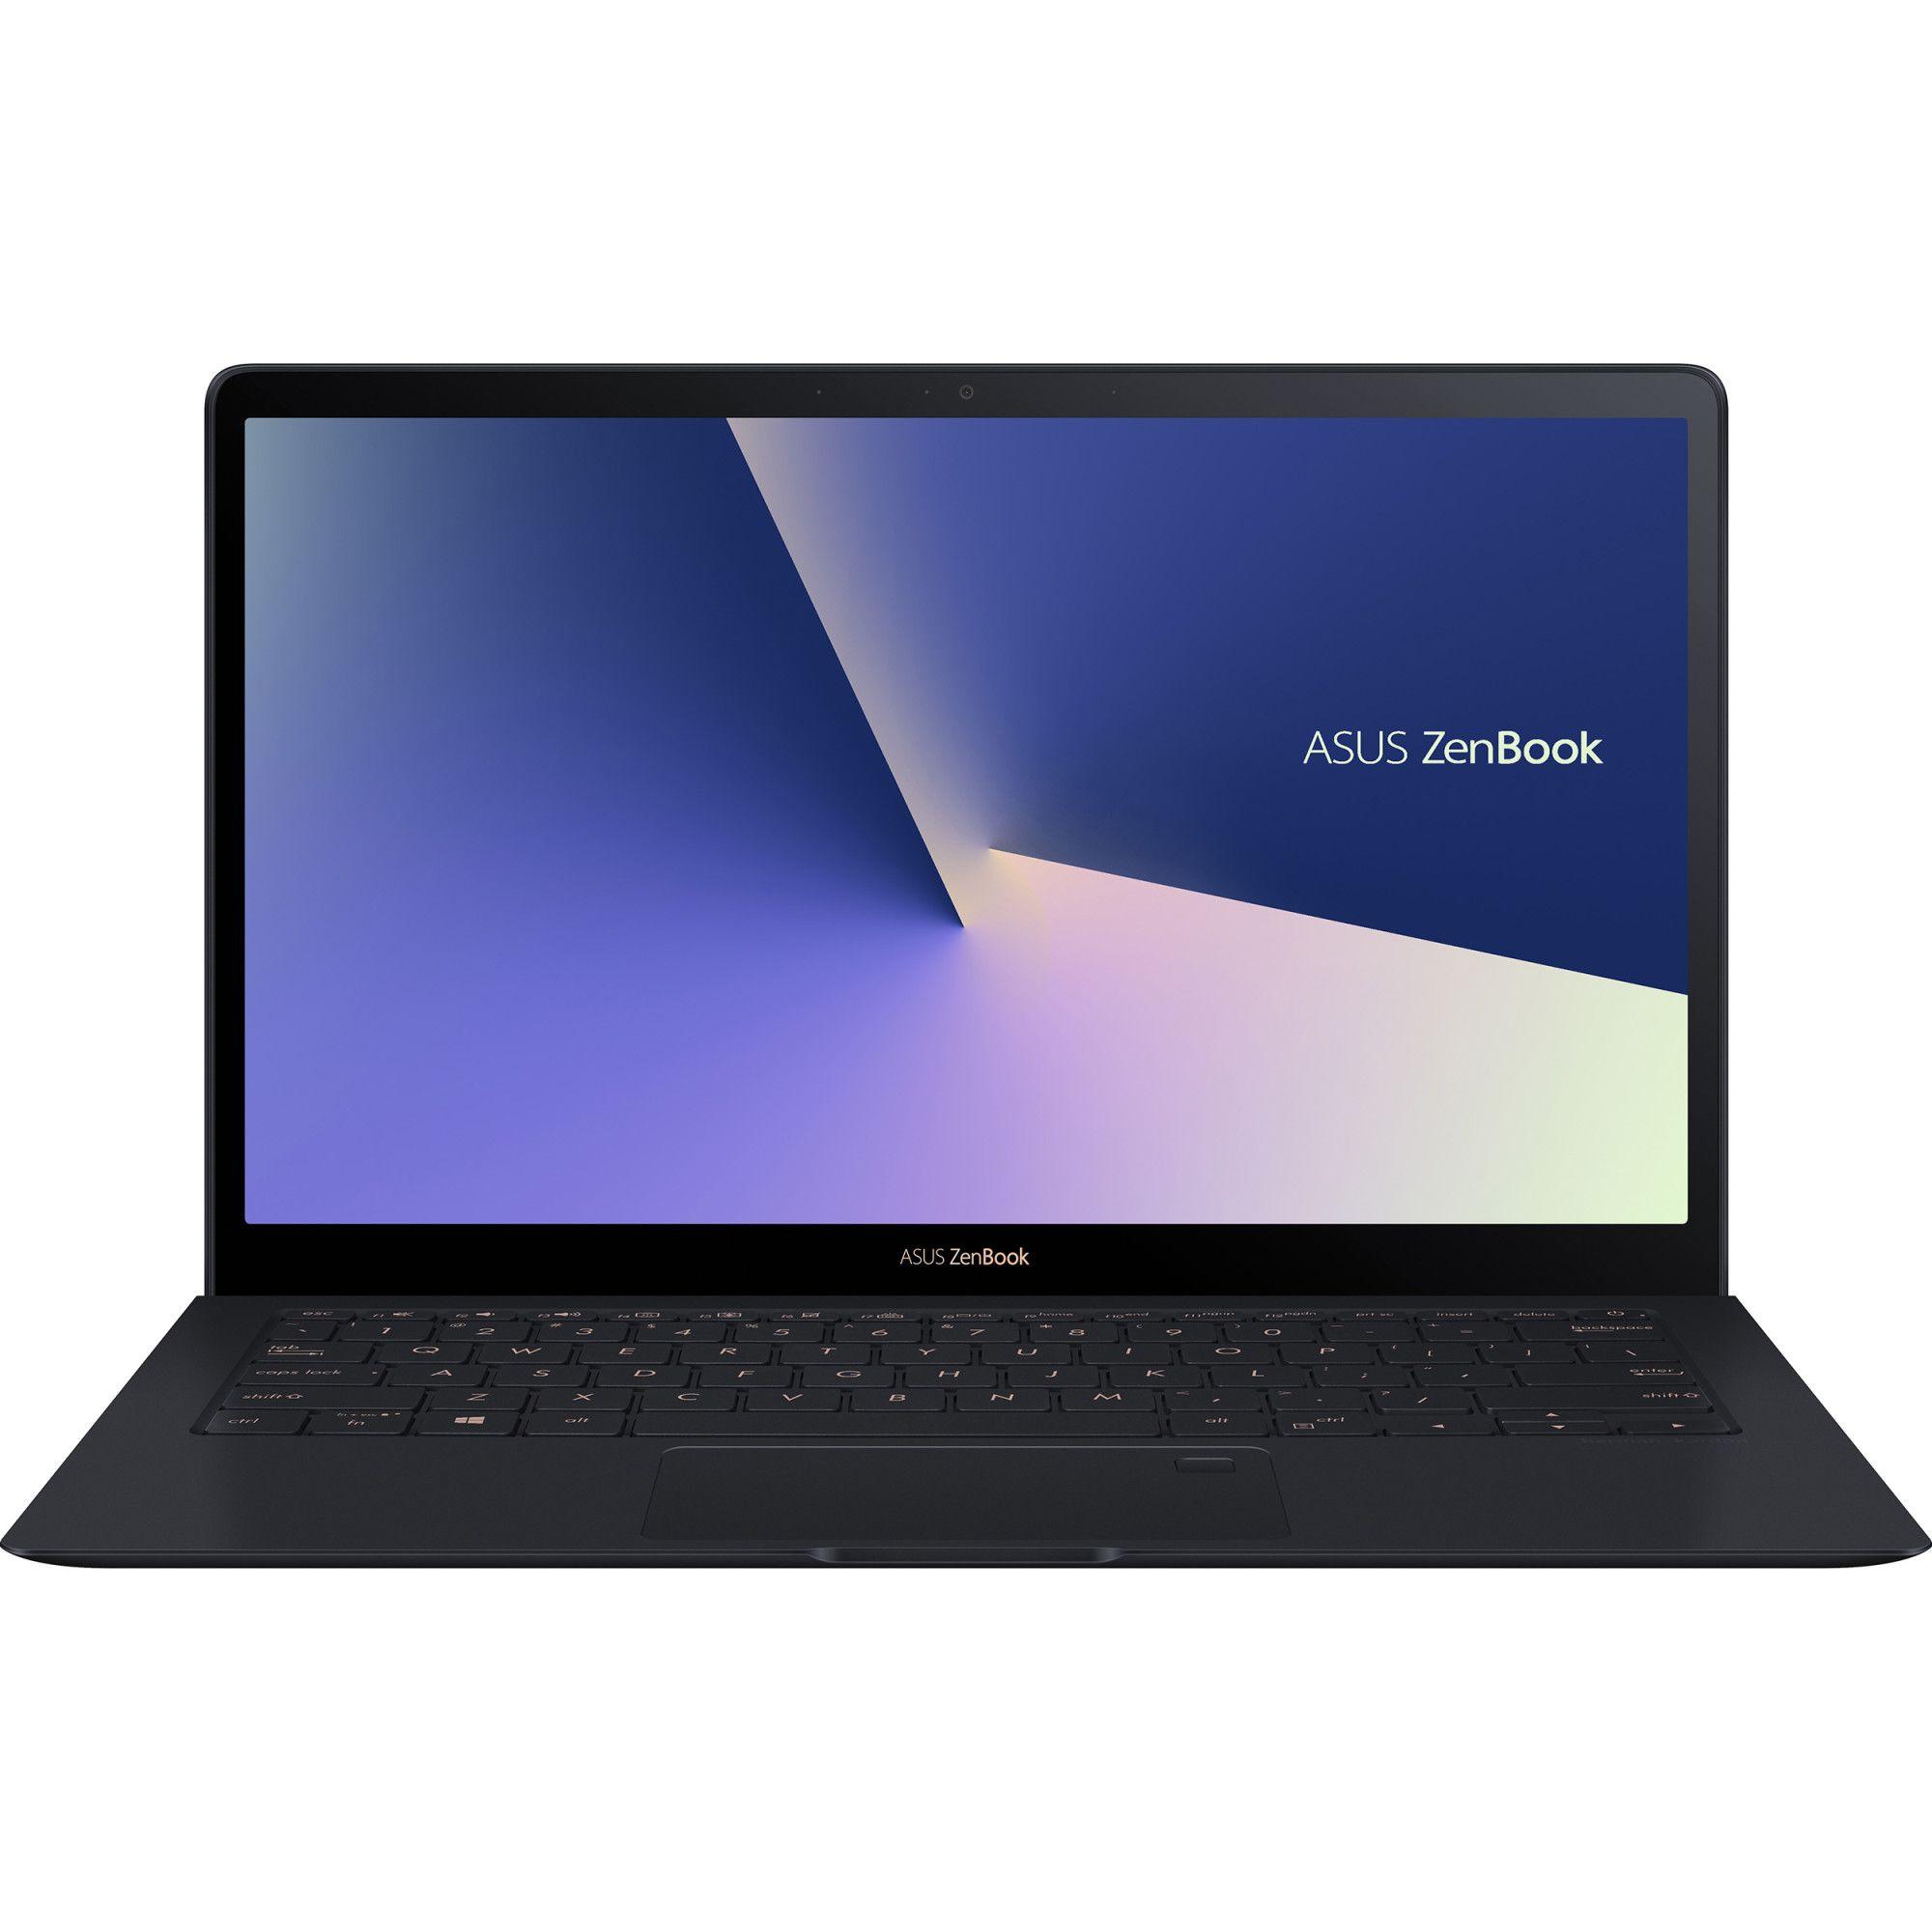 Ultrabook Asus ZenBook S UX391FA 13.3 Full HD Intel Core i7-8565U RAM 16GB SSD 512GB Windows 10 Pro Albastru